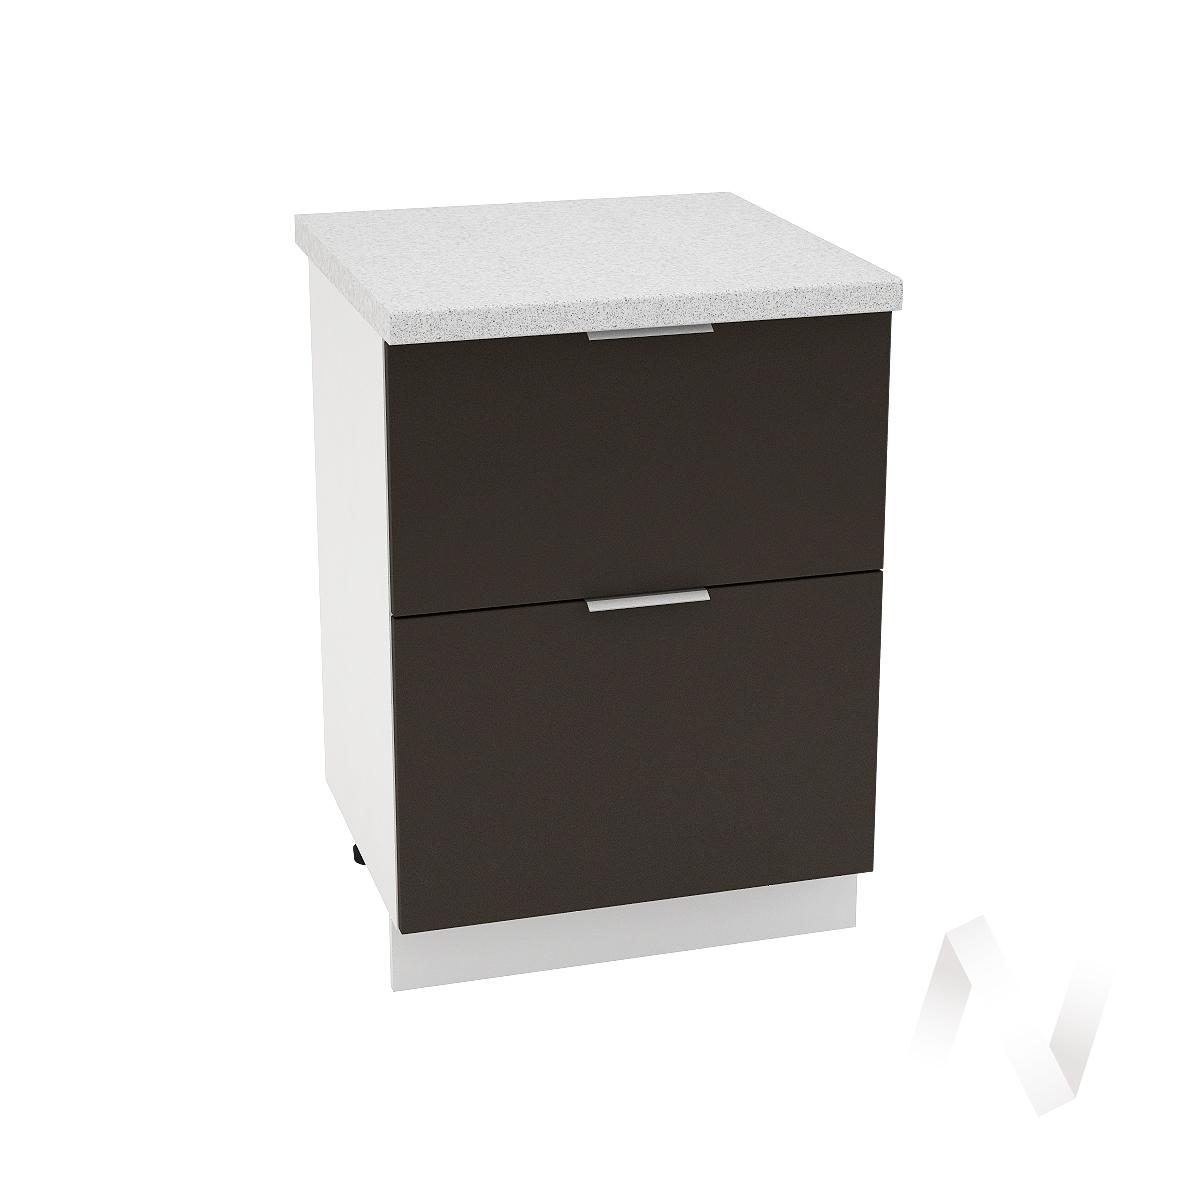 "Кухня ""Терра"": Шкаф нижний с 2-мя ящиками 600, ШН2Я 600 (смоки софт/корпус белый)"